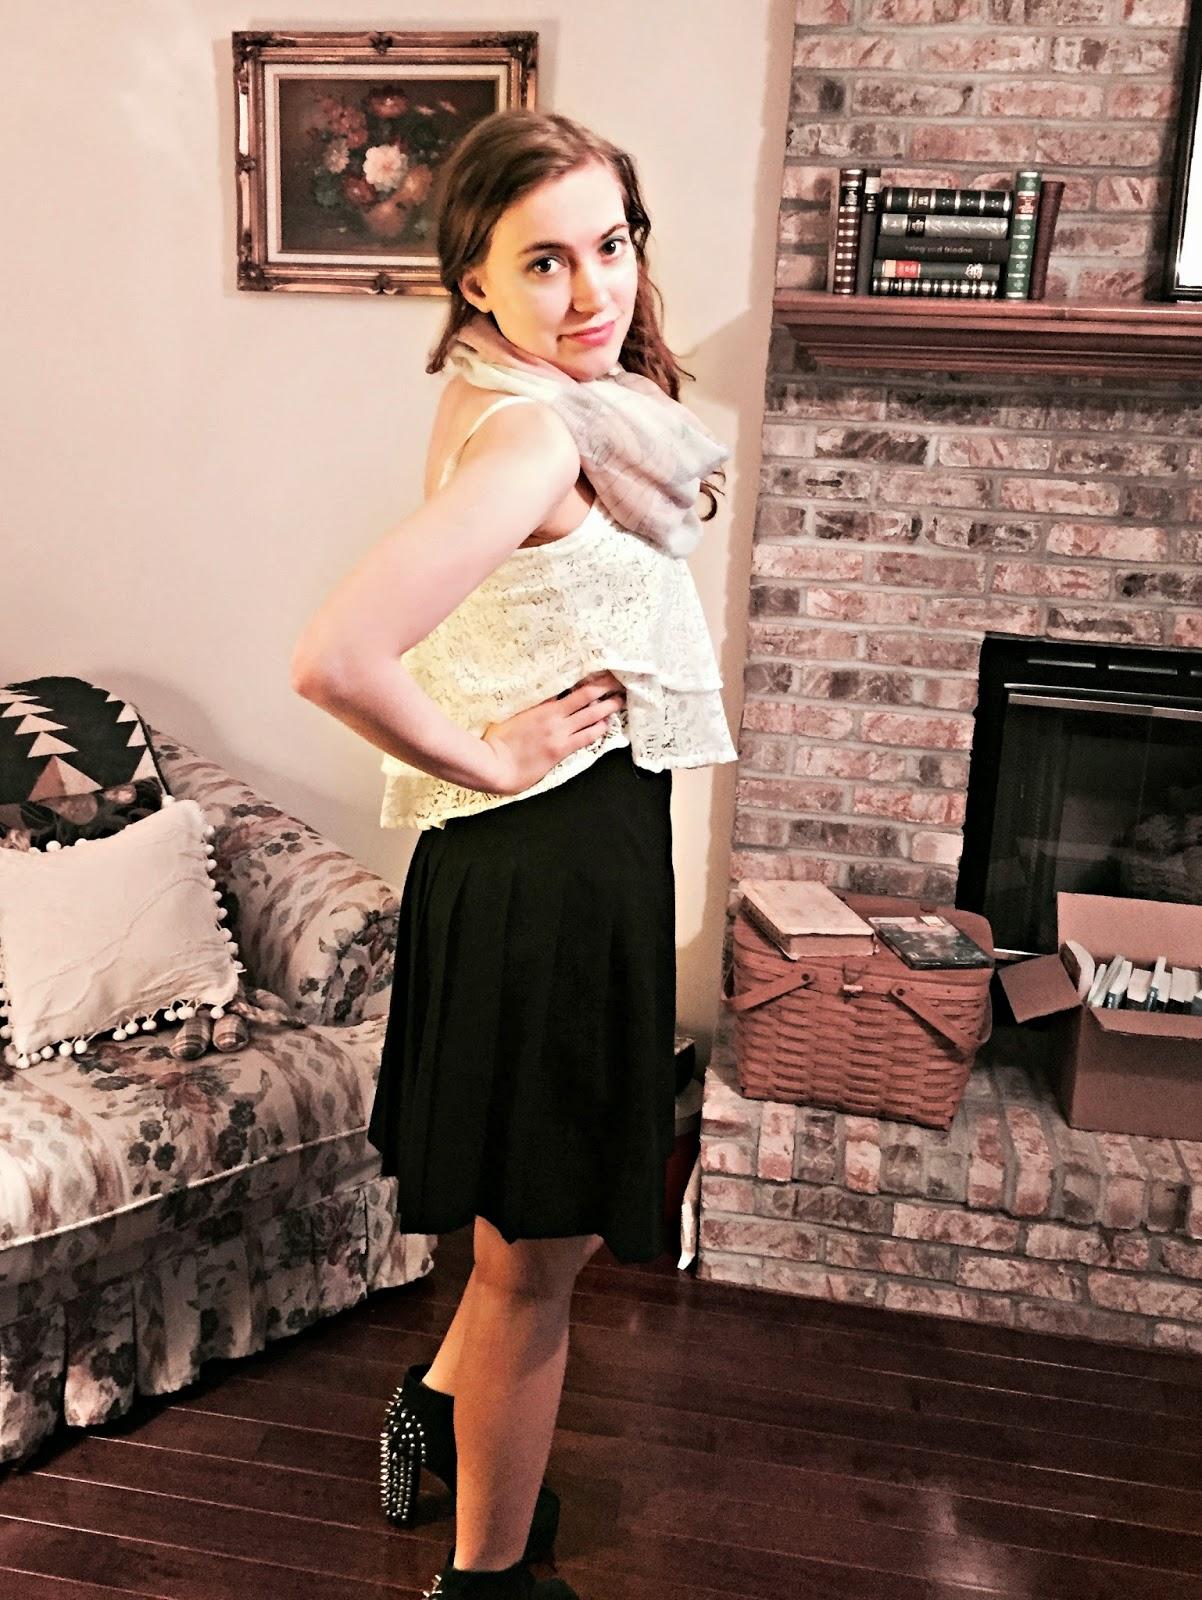 skirt-for-before-romance-day